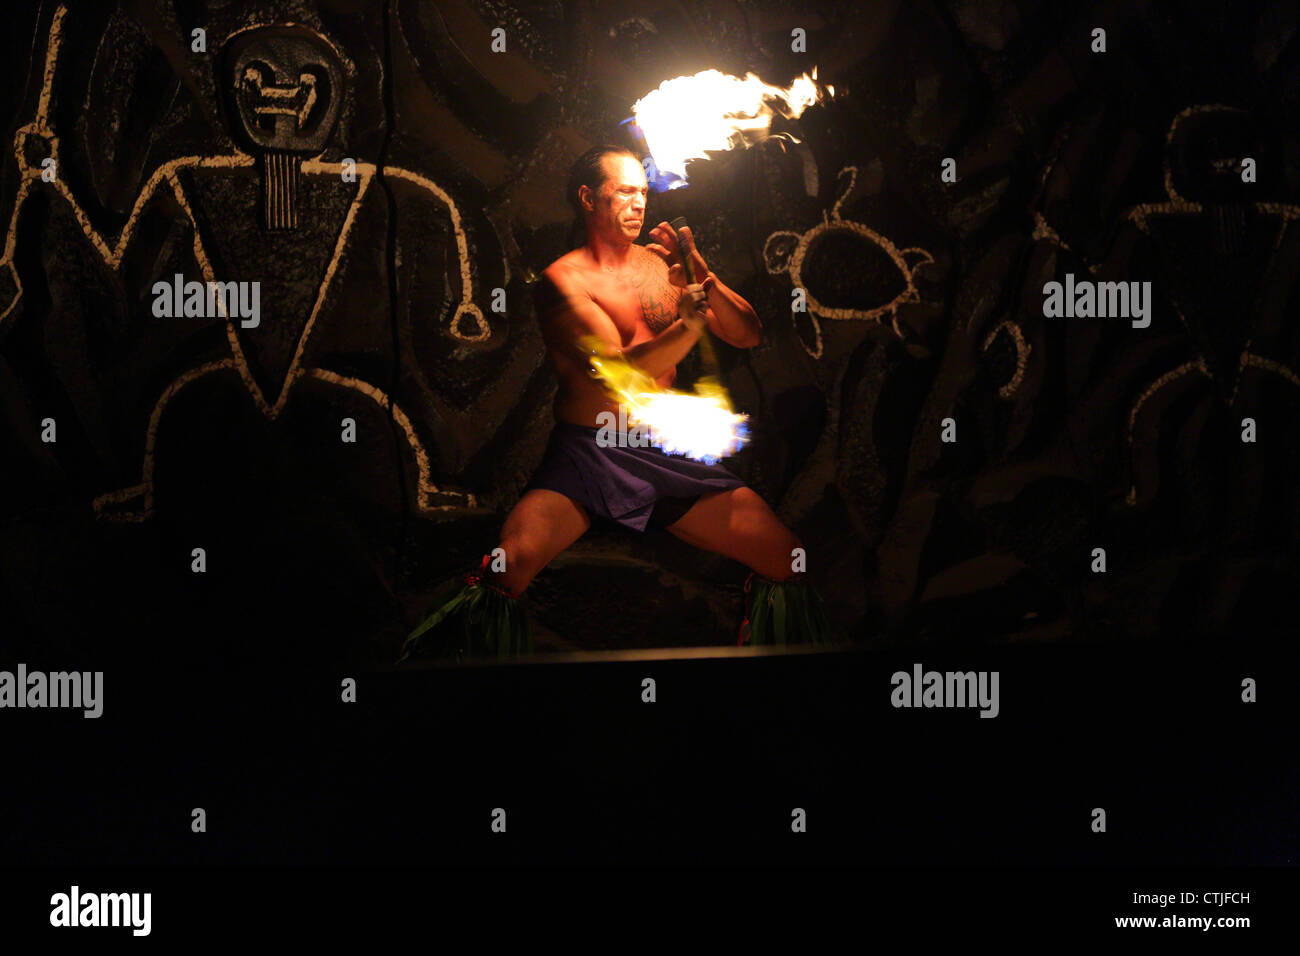 Fire performer at Hawaiian Luau - Stock Image